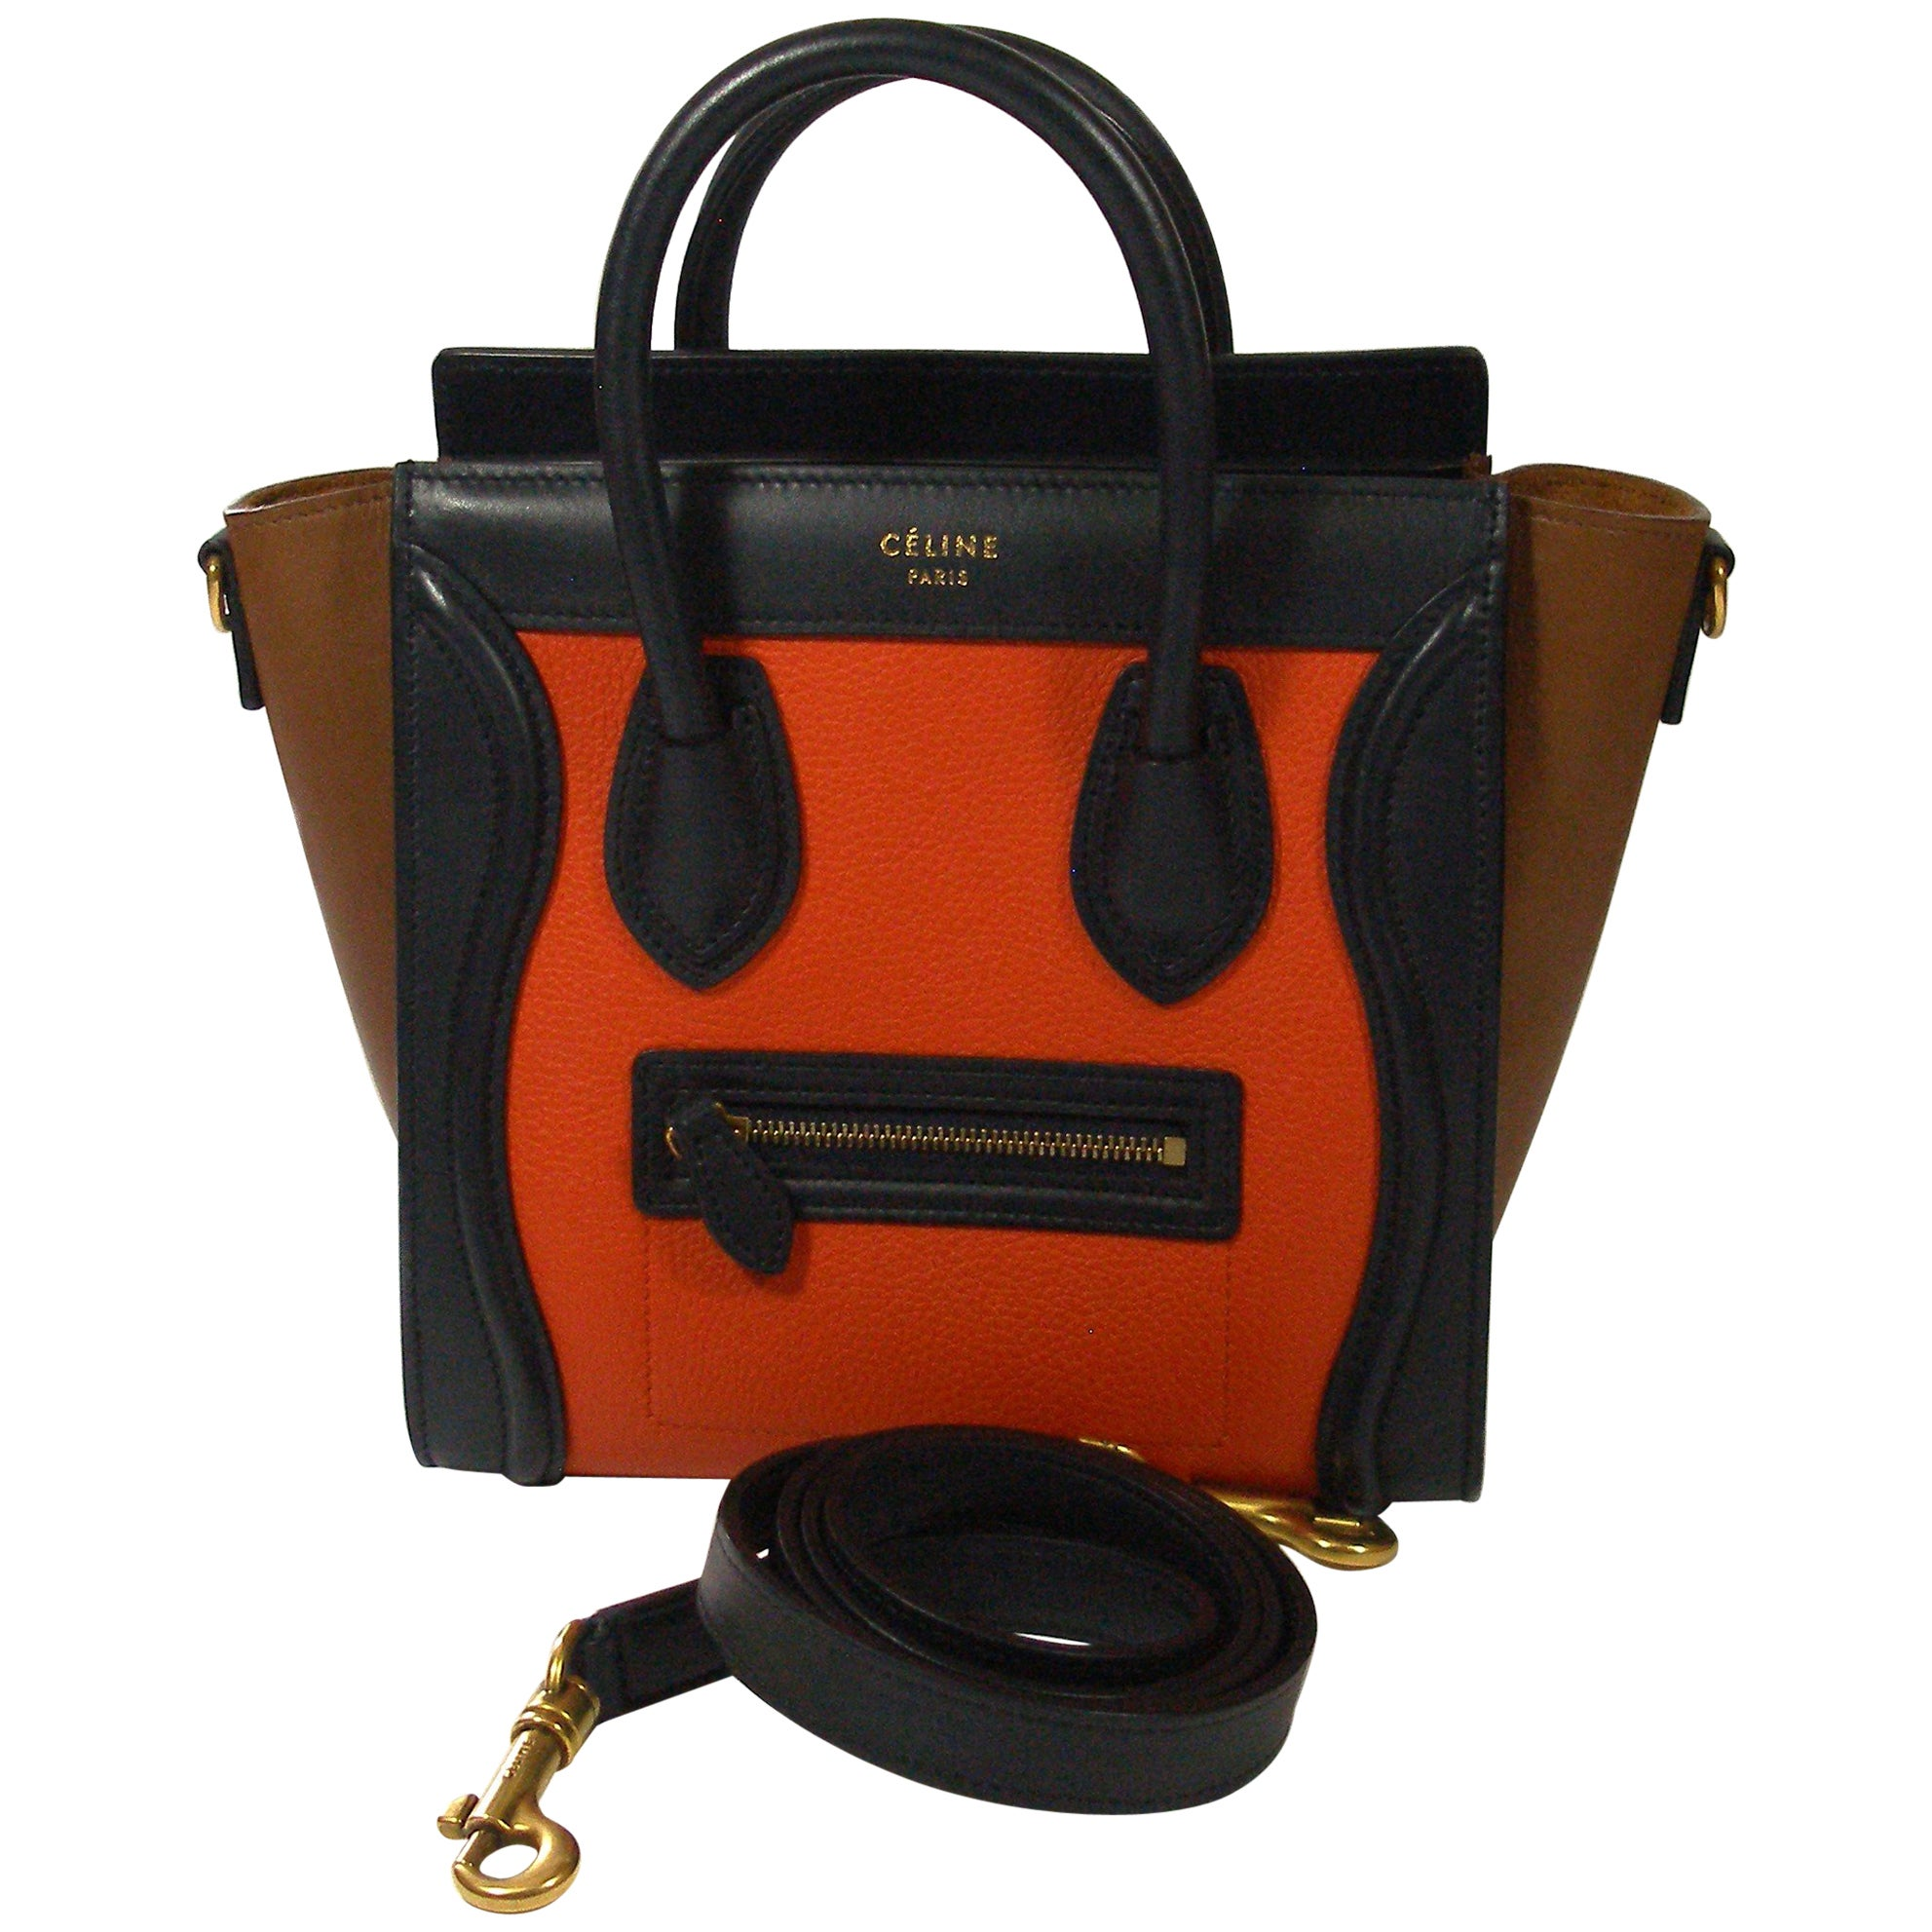 d802bf64d3 Céline Mini Luggage Multi-color Calfskin Leather Handle Bag / RARE COLOR at  1stdibs